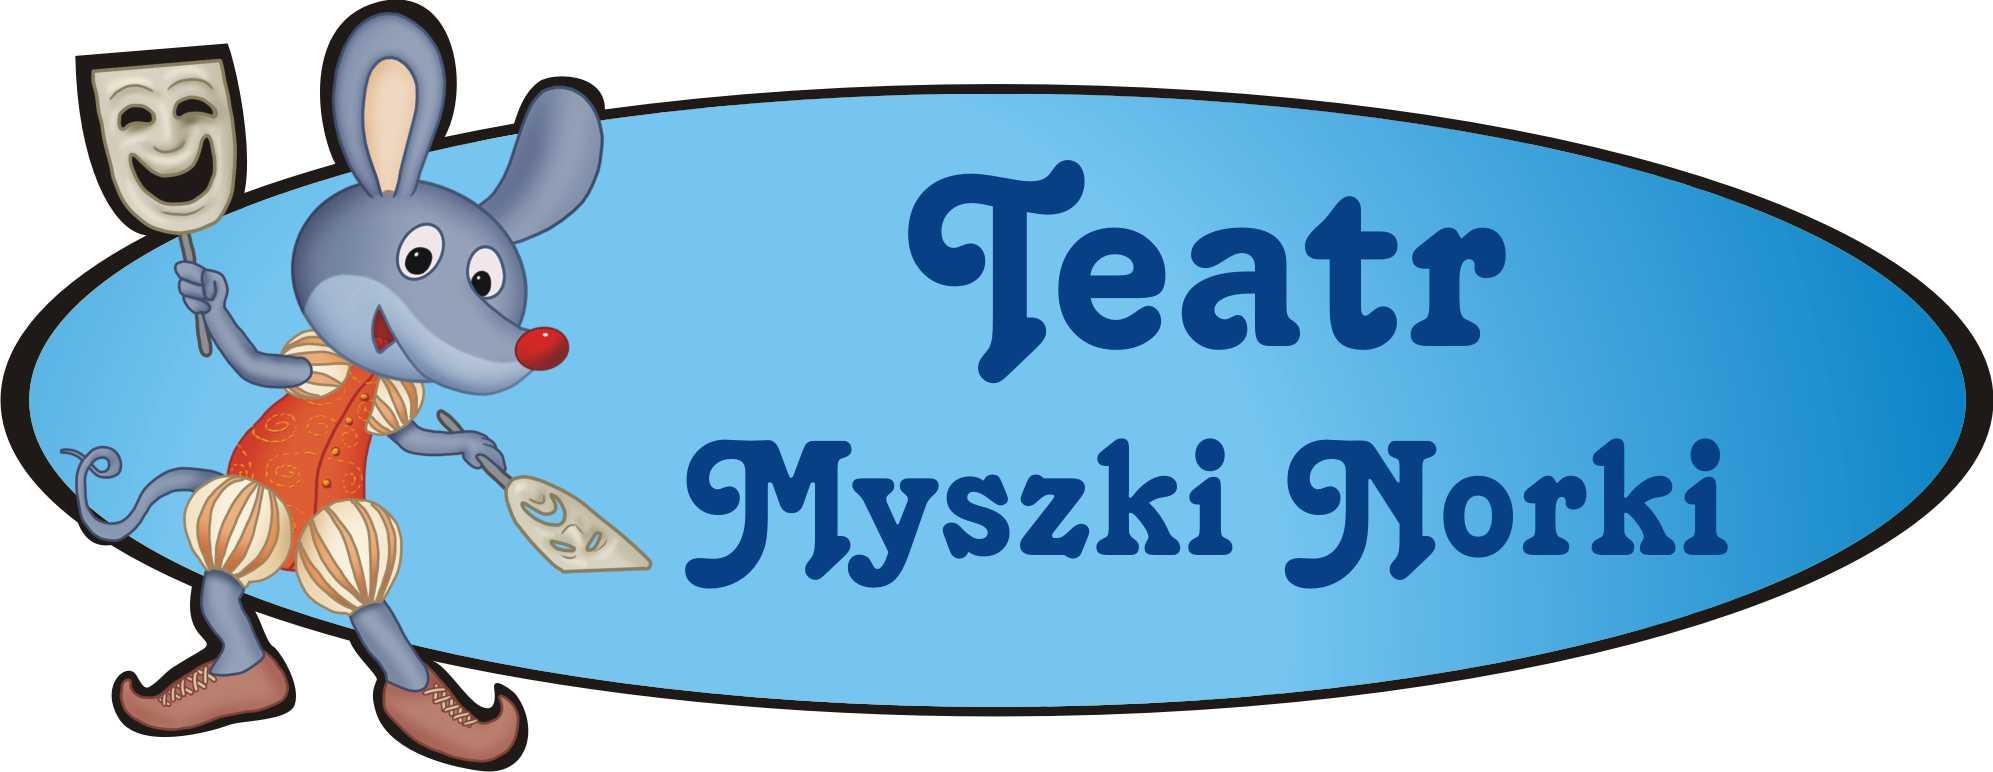 teatr_myszki_norki_RGB